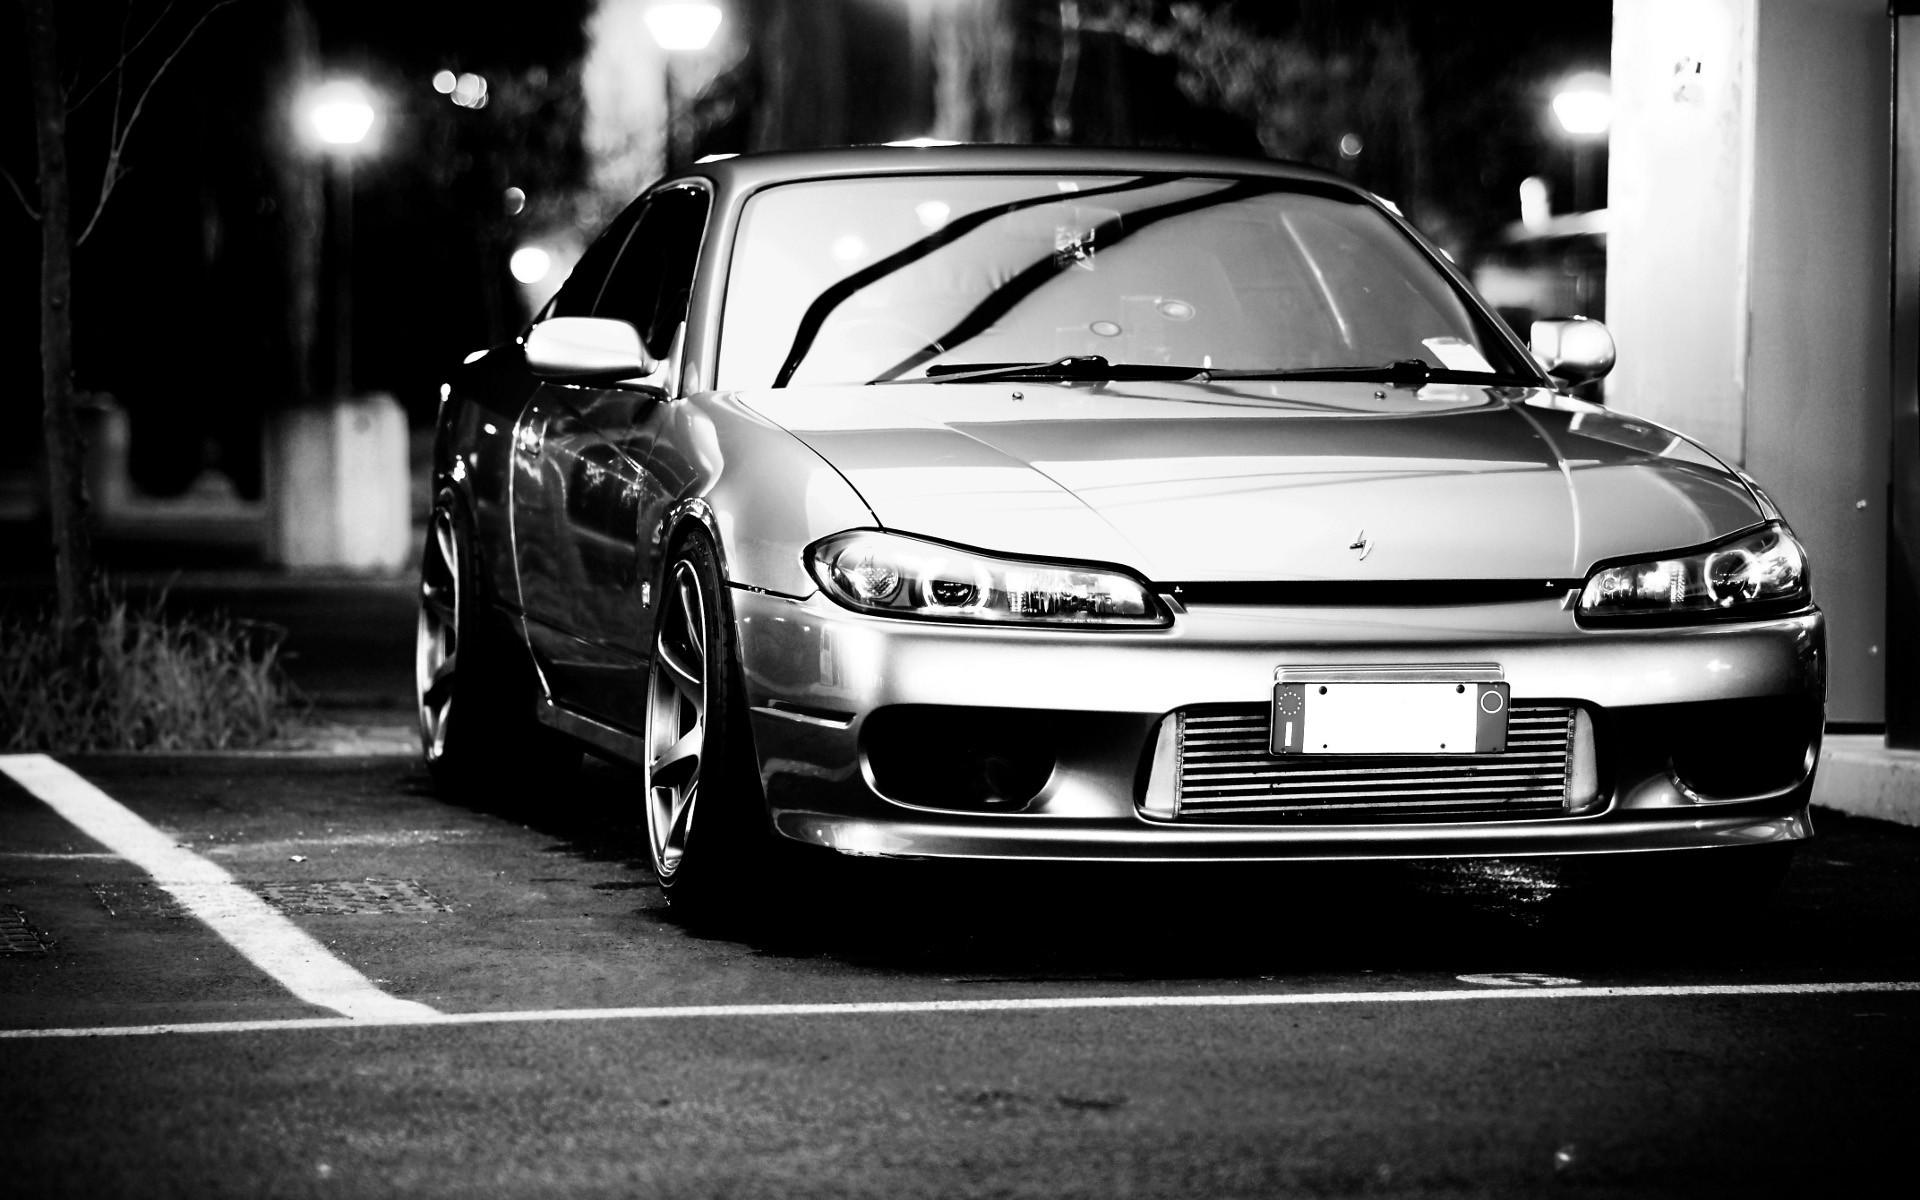 Cars Monochrome Nissan Silvia S15 Jdm Wallpaper